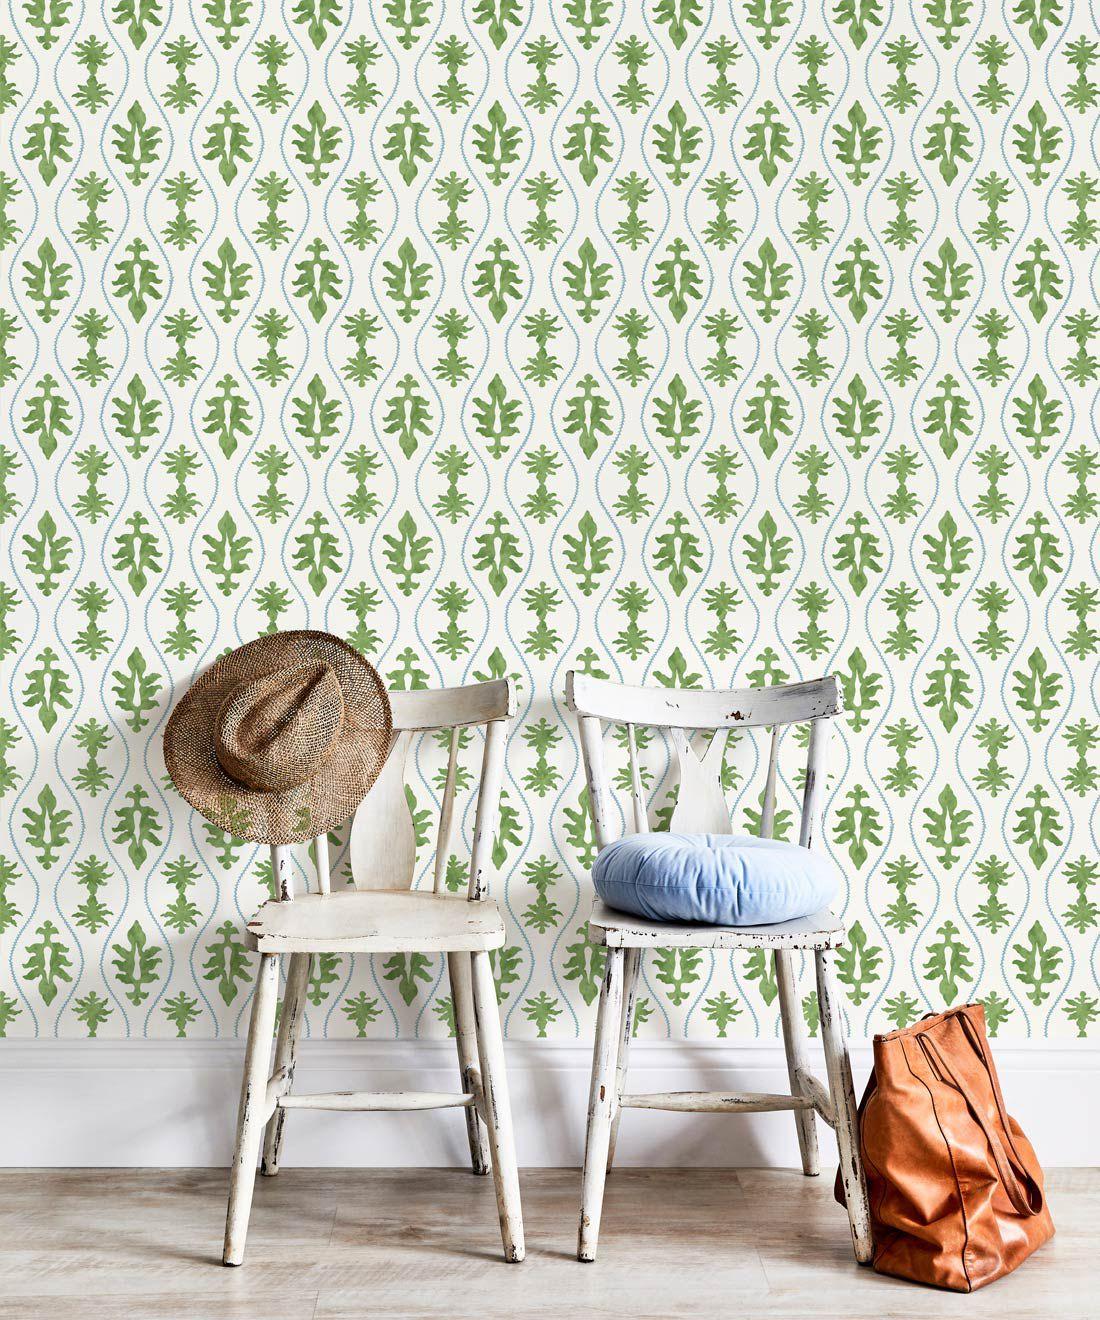 Great Jones Wallpaper • Dianne Bergeron • Moss •Insitu